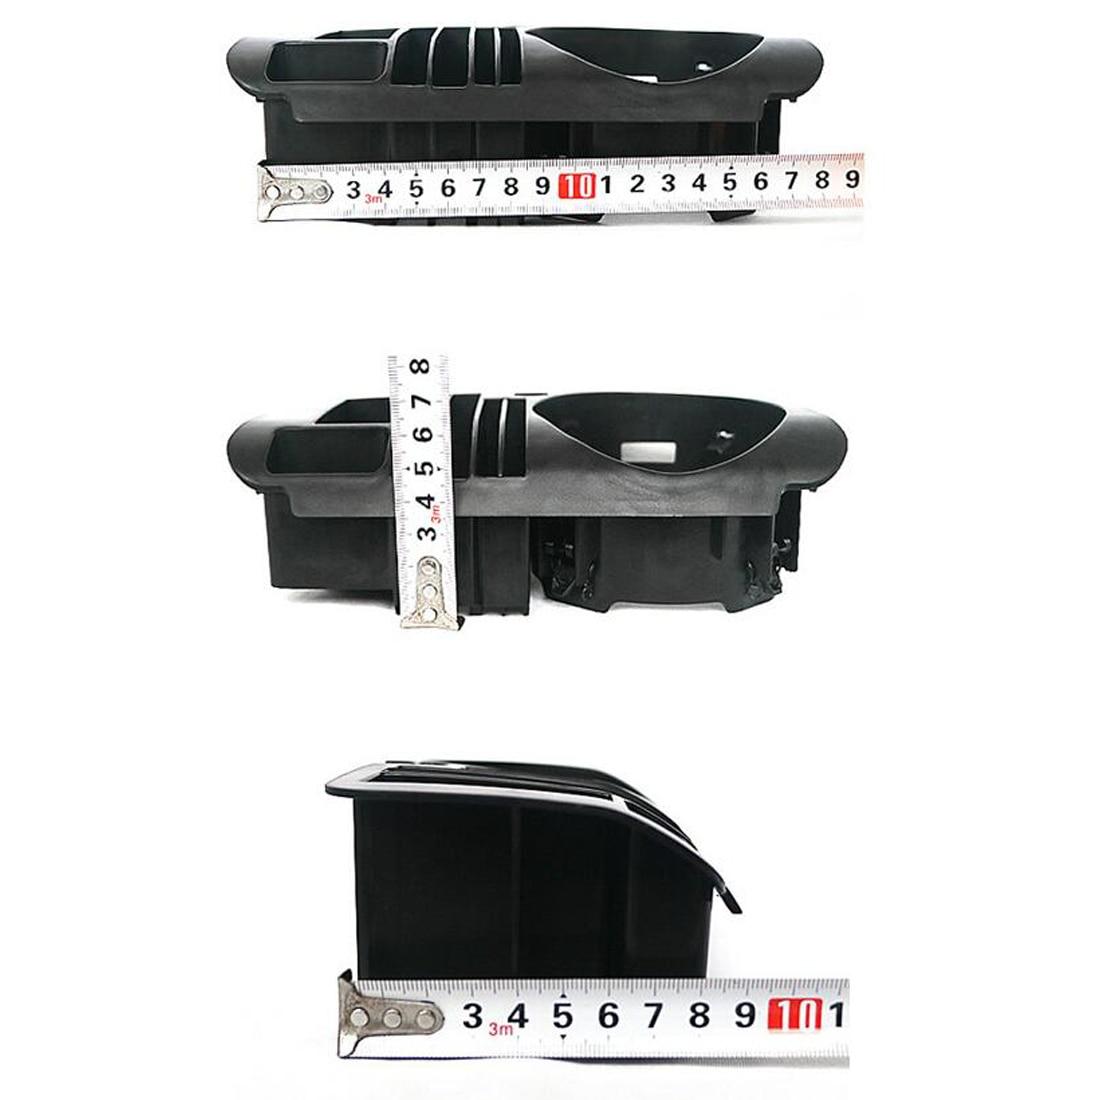 Dewtreetali Car Accessories Car Central Storage Box Cup Holder For Mercedes Benz C class W205/GLC Class X253/E class W213 e200 автомобильный коврик seintex 86286 для mercedes c class w205